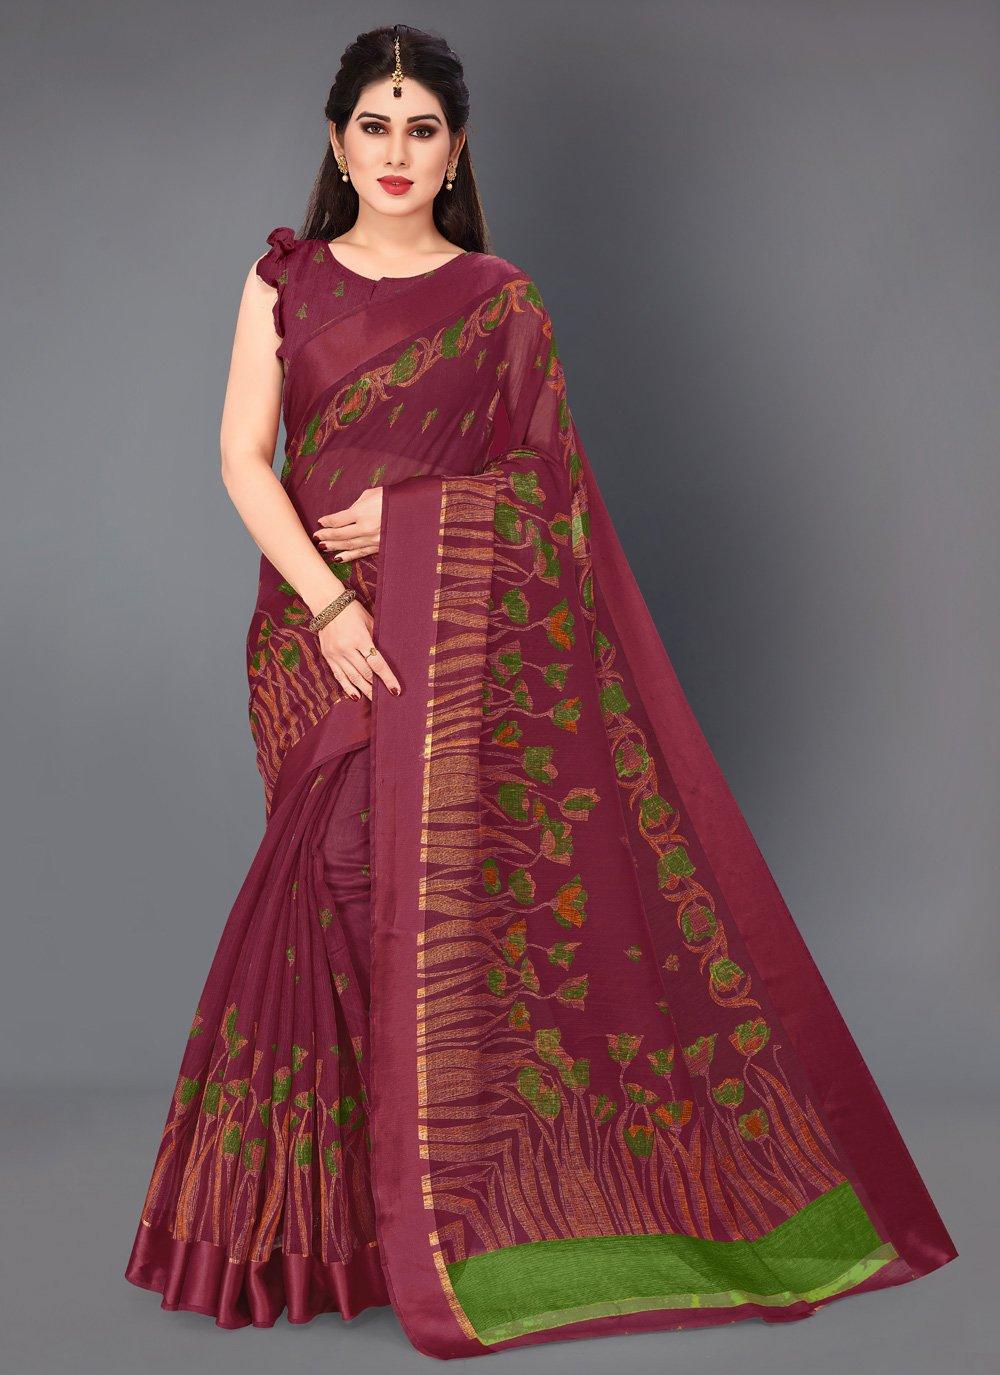 Printed Cotton Classic Saree